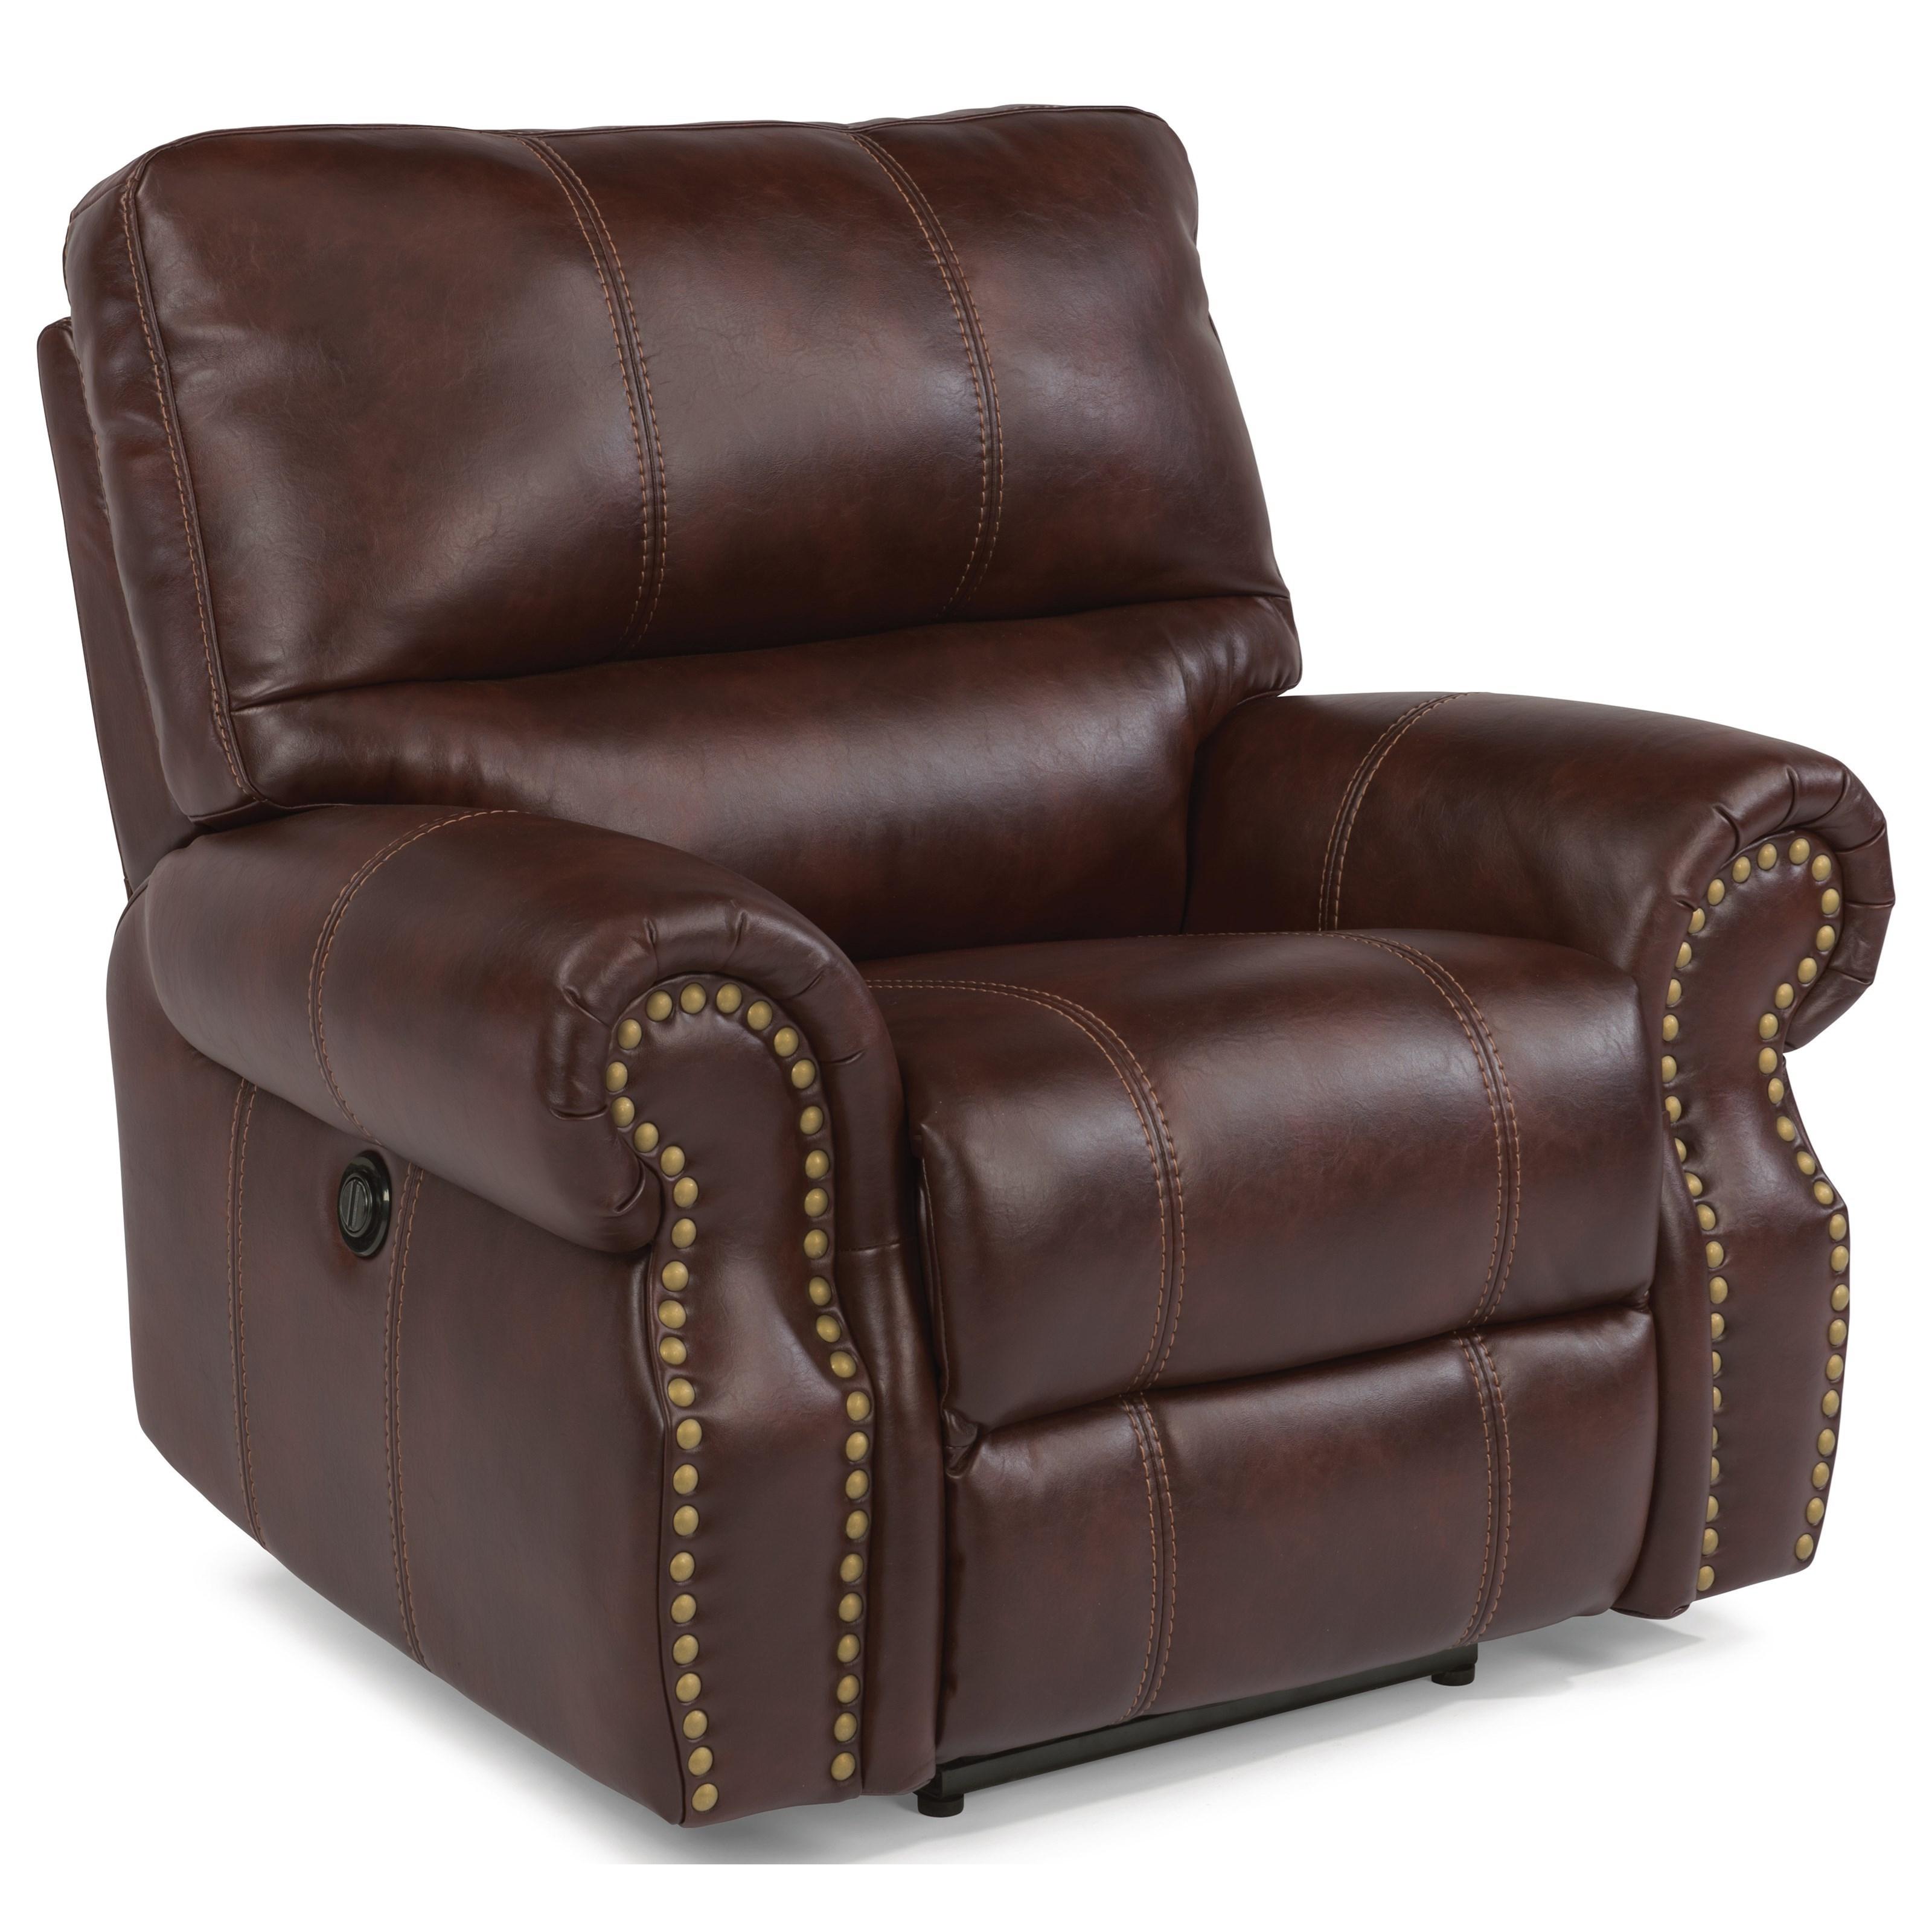 Flexsteel Furniture Telephone Number: Flexsteel Latitudes-Carlton Traditional Power Recliner